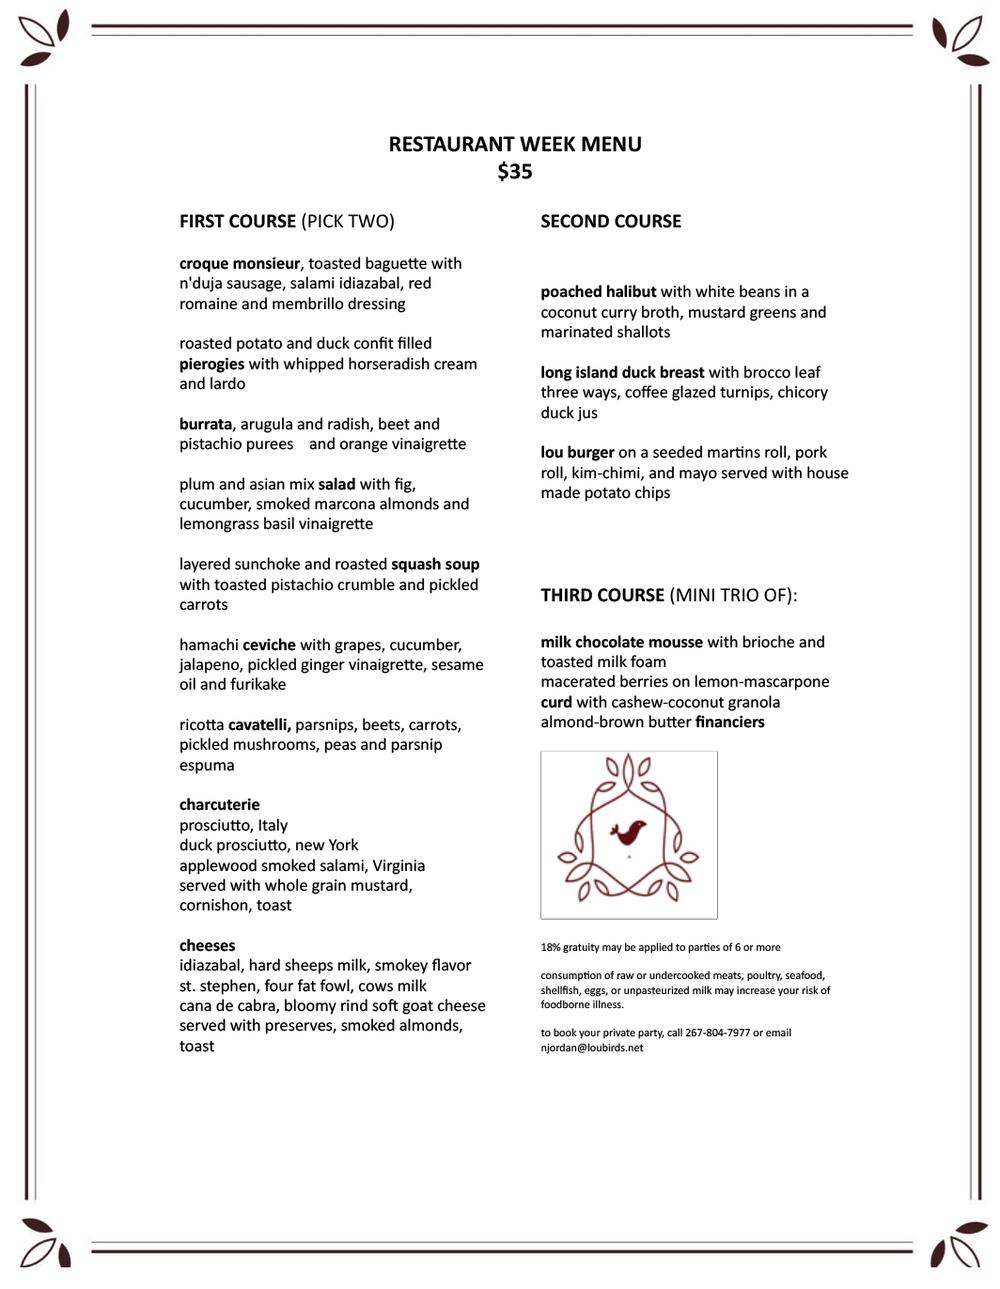 2018 Restaurant Week MENU  | Click graphic to download a PDF of the menu